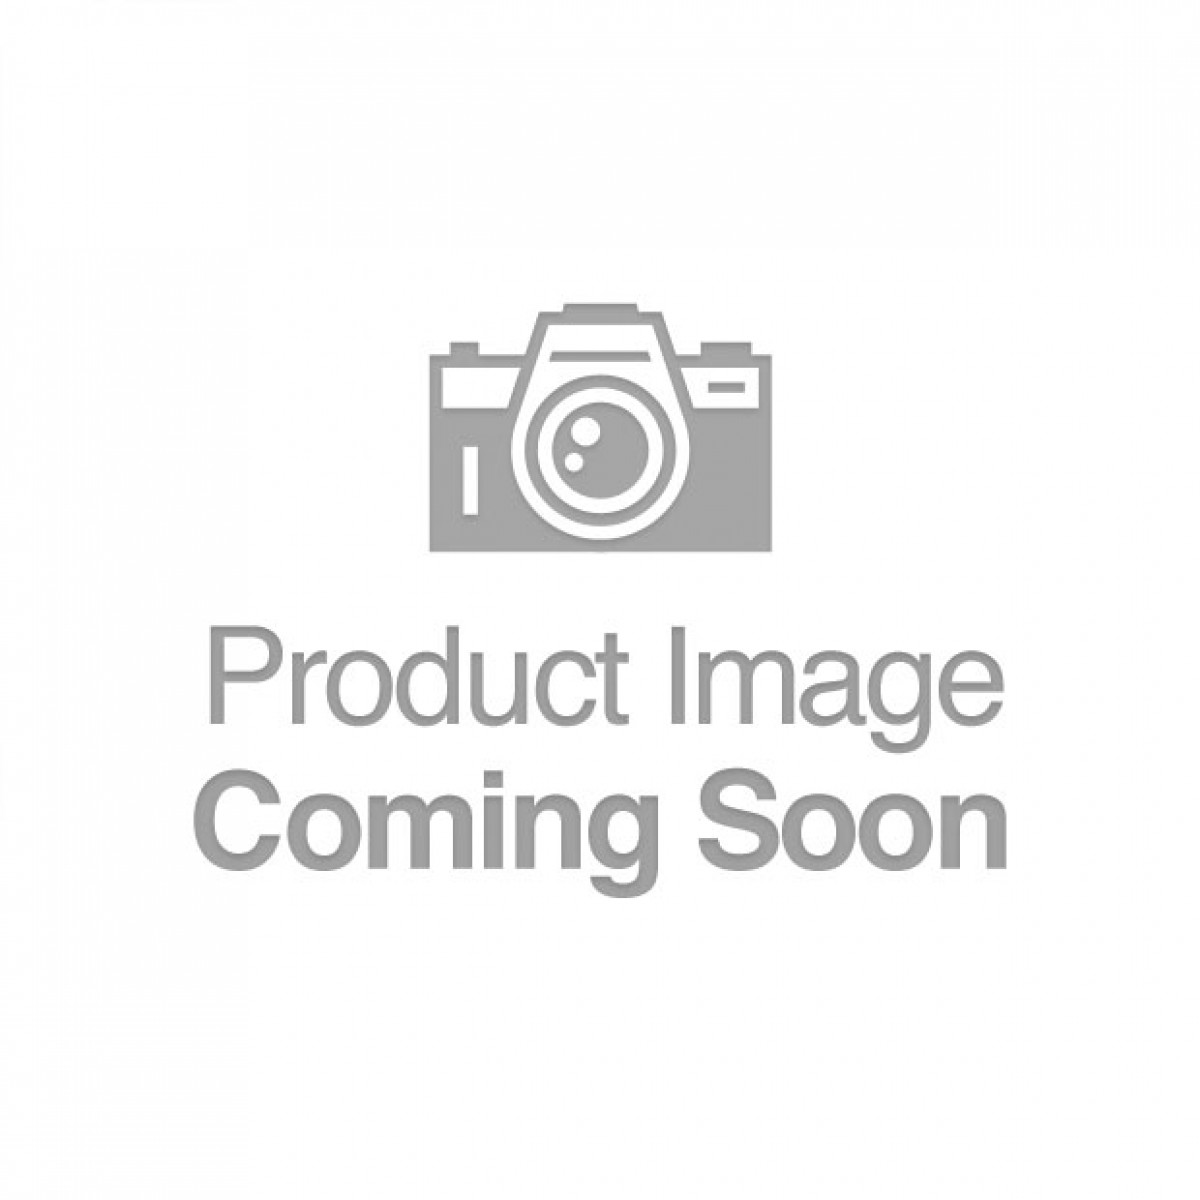 Power Gem Vibrating Crystal Probe - Purple